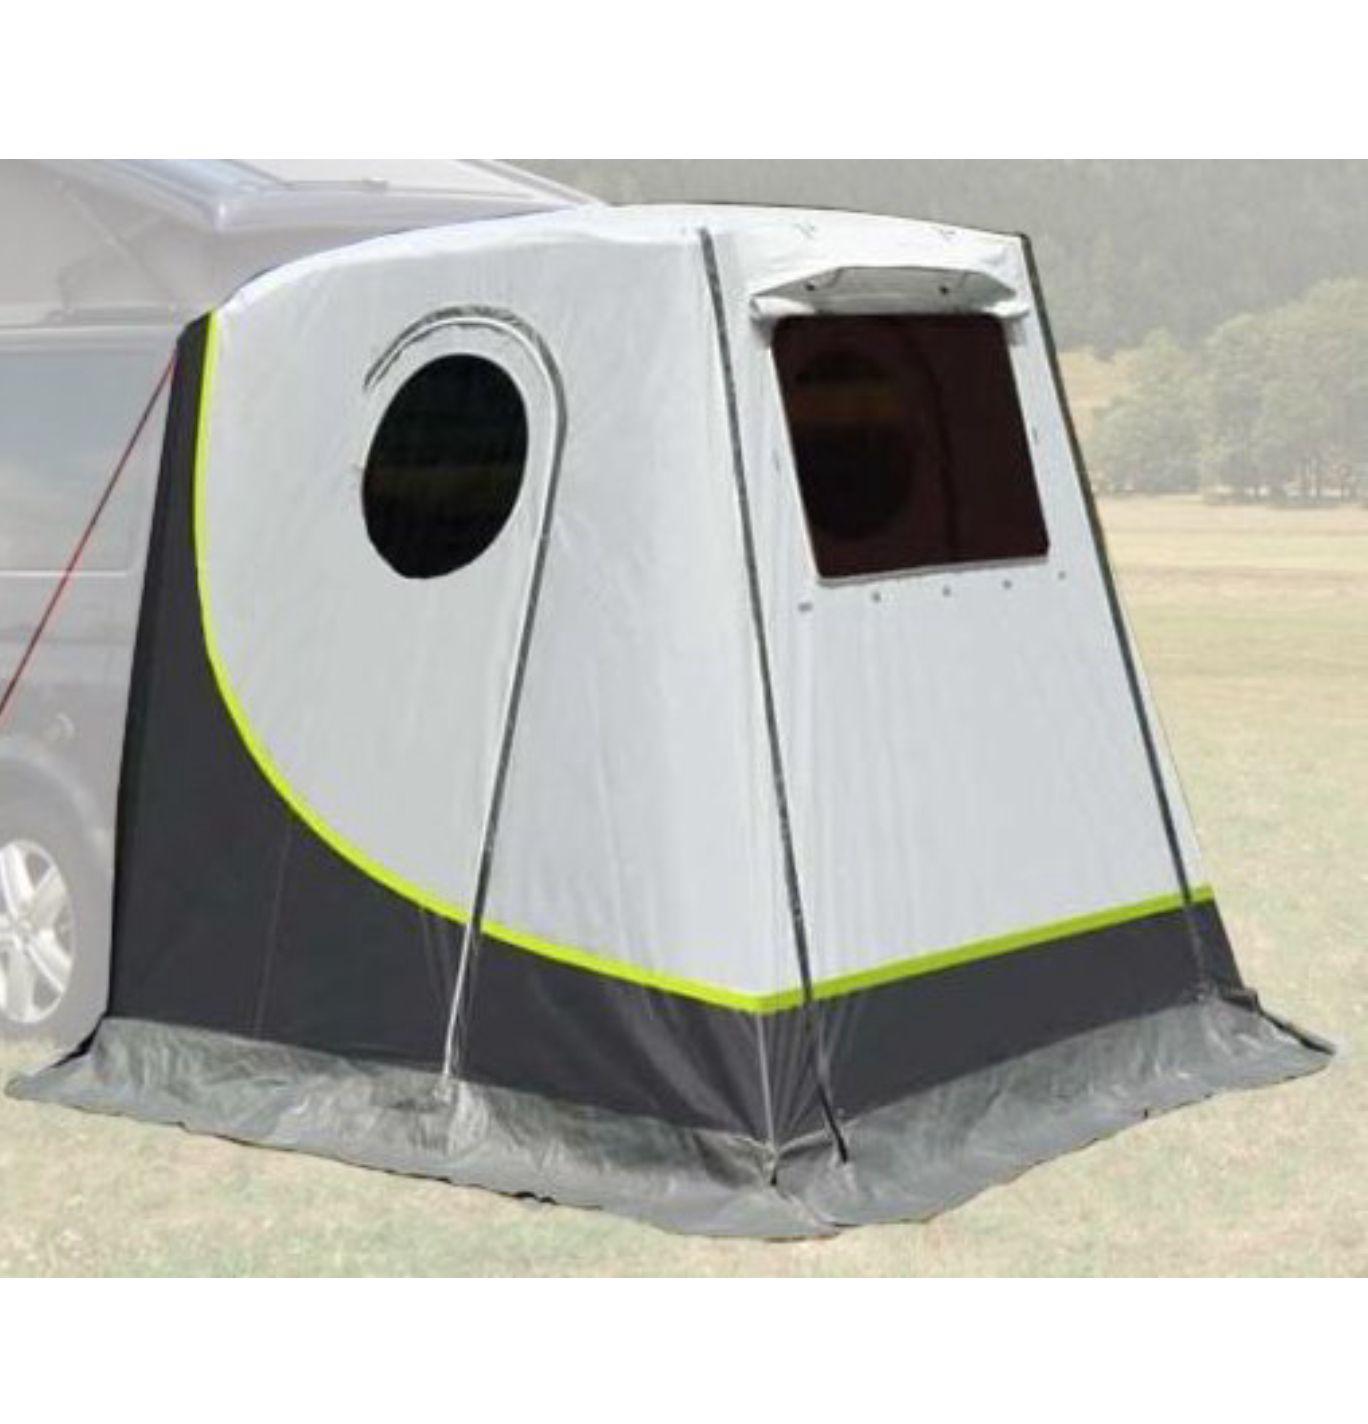 Reimo Upgrade 2 Cabin Tailgate Tent u0026 Ground Sheet Bundle - £185.00  sc 1 st  Pinterest & Reimo Upgrade 2 Cabin Tailgate Tent u0026 Ground Sheet Bundle ...